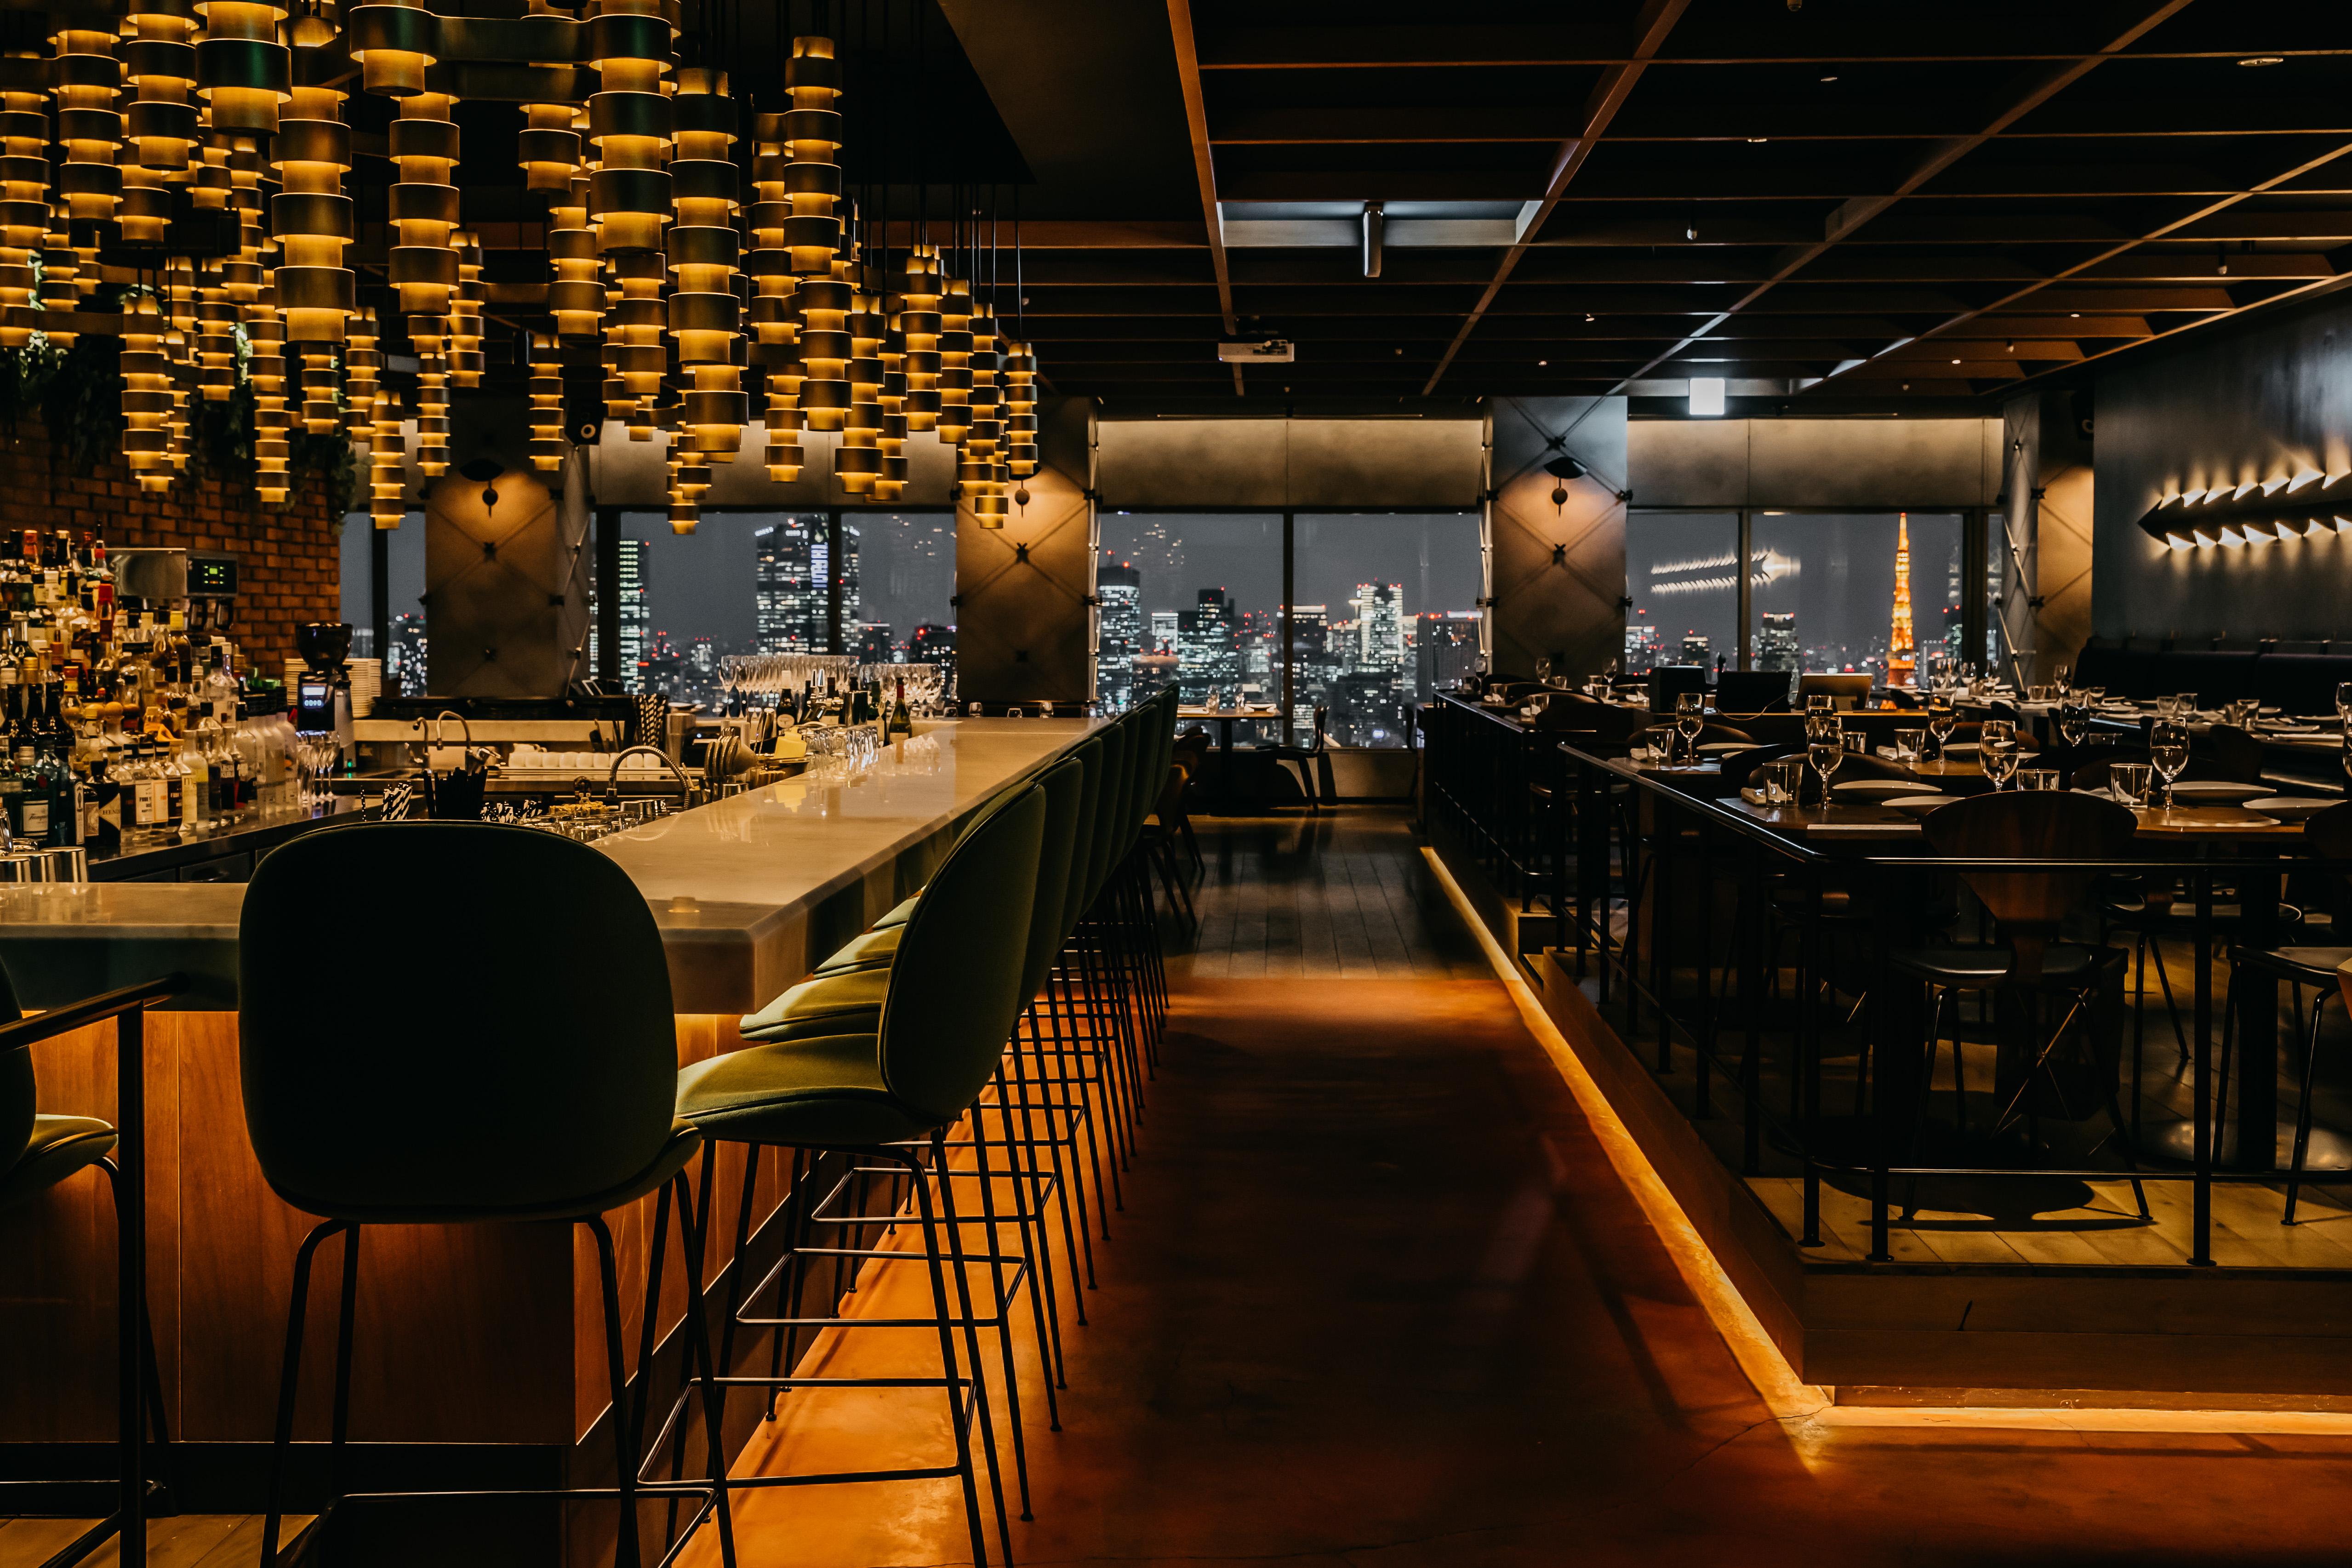 【Longrain】最上階から望めるパノラマ夜景を窓側席で!非日常な空間で、大切な方とのお食事を!